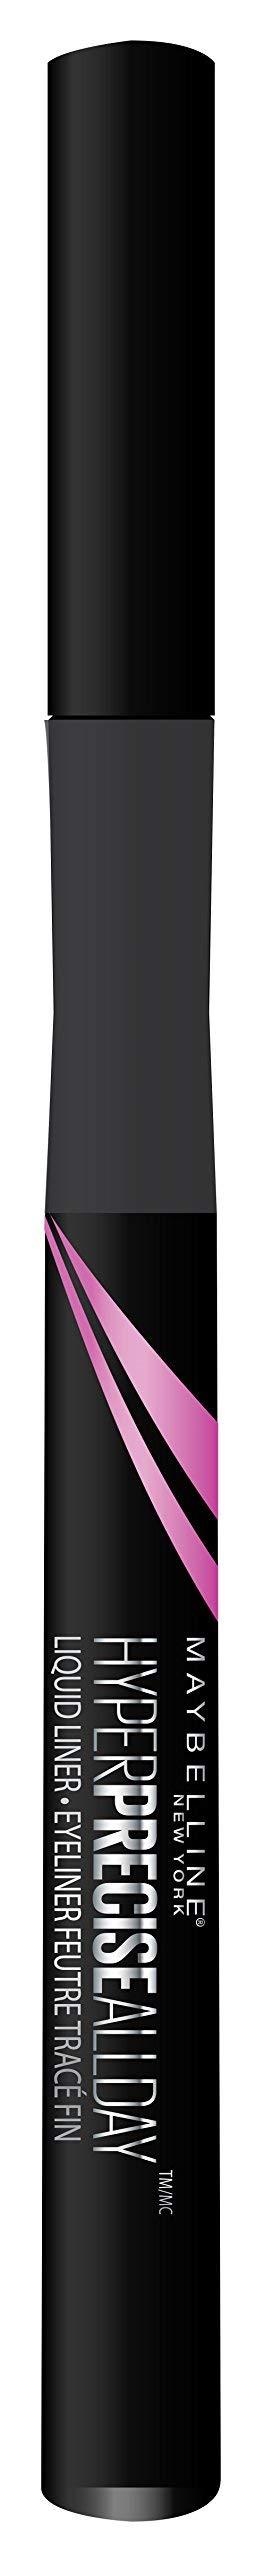 Maybelline New York - Eyeliner Hyper Precise Liner Feutre Pointe Fine - Noir 700 Black 1 ml product image